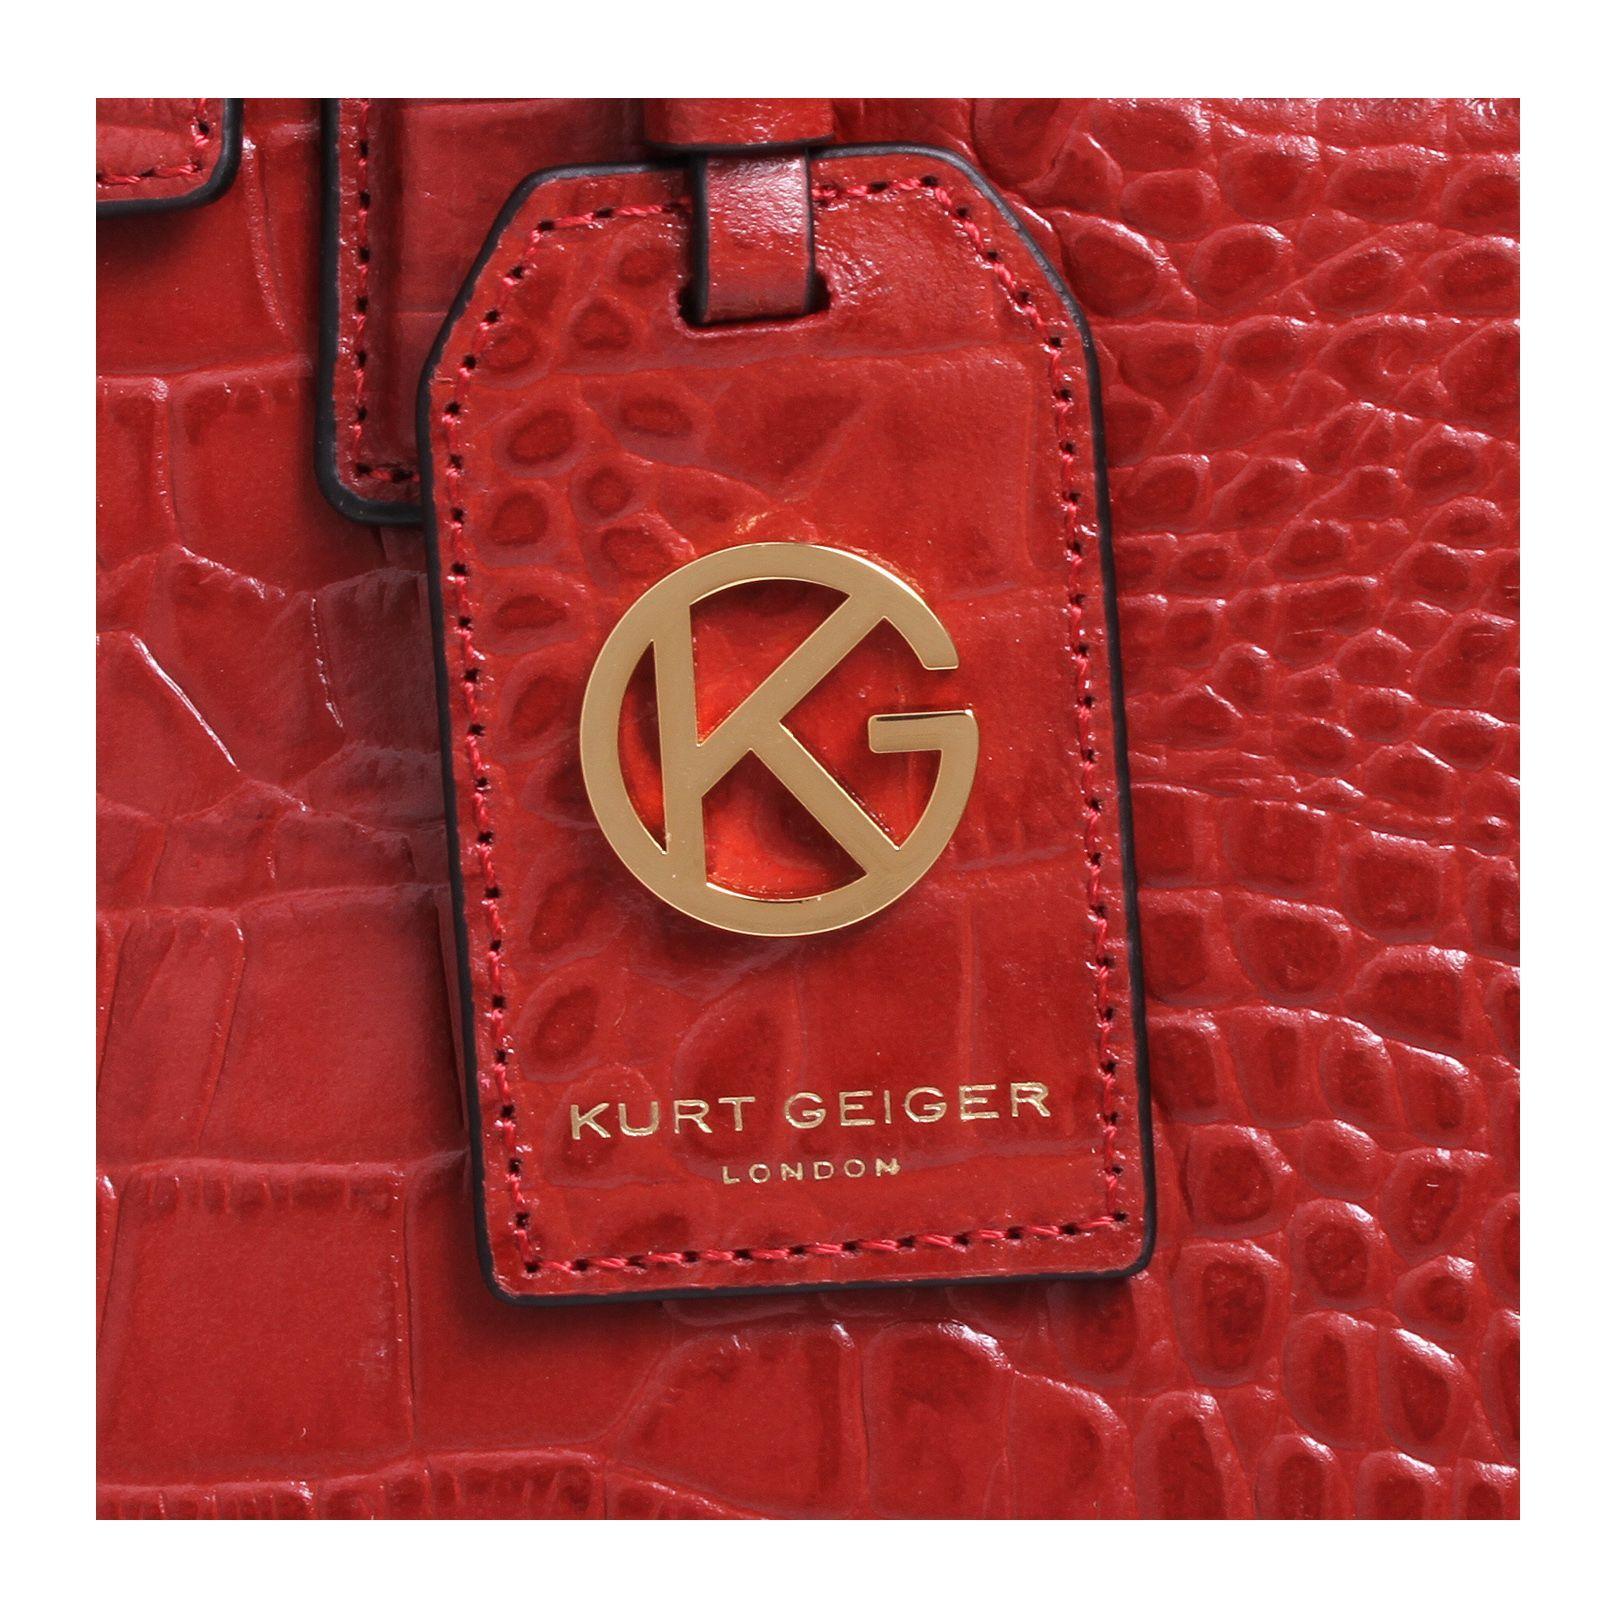 Kurt Geiger Leather Croc London Tote Bag in Rust (Brown)